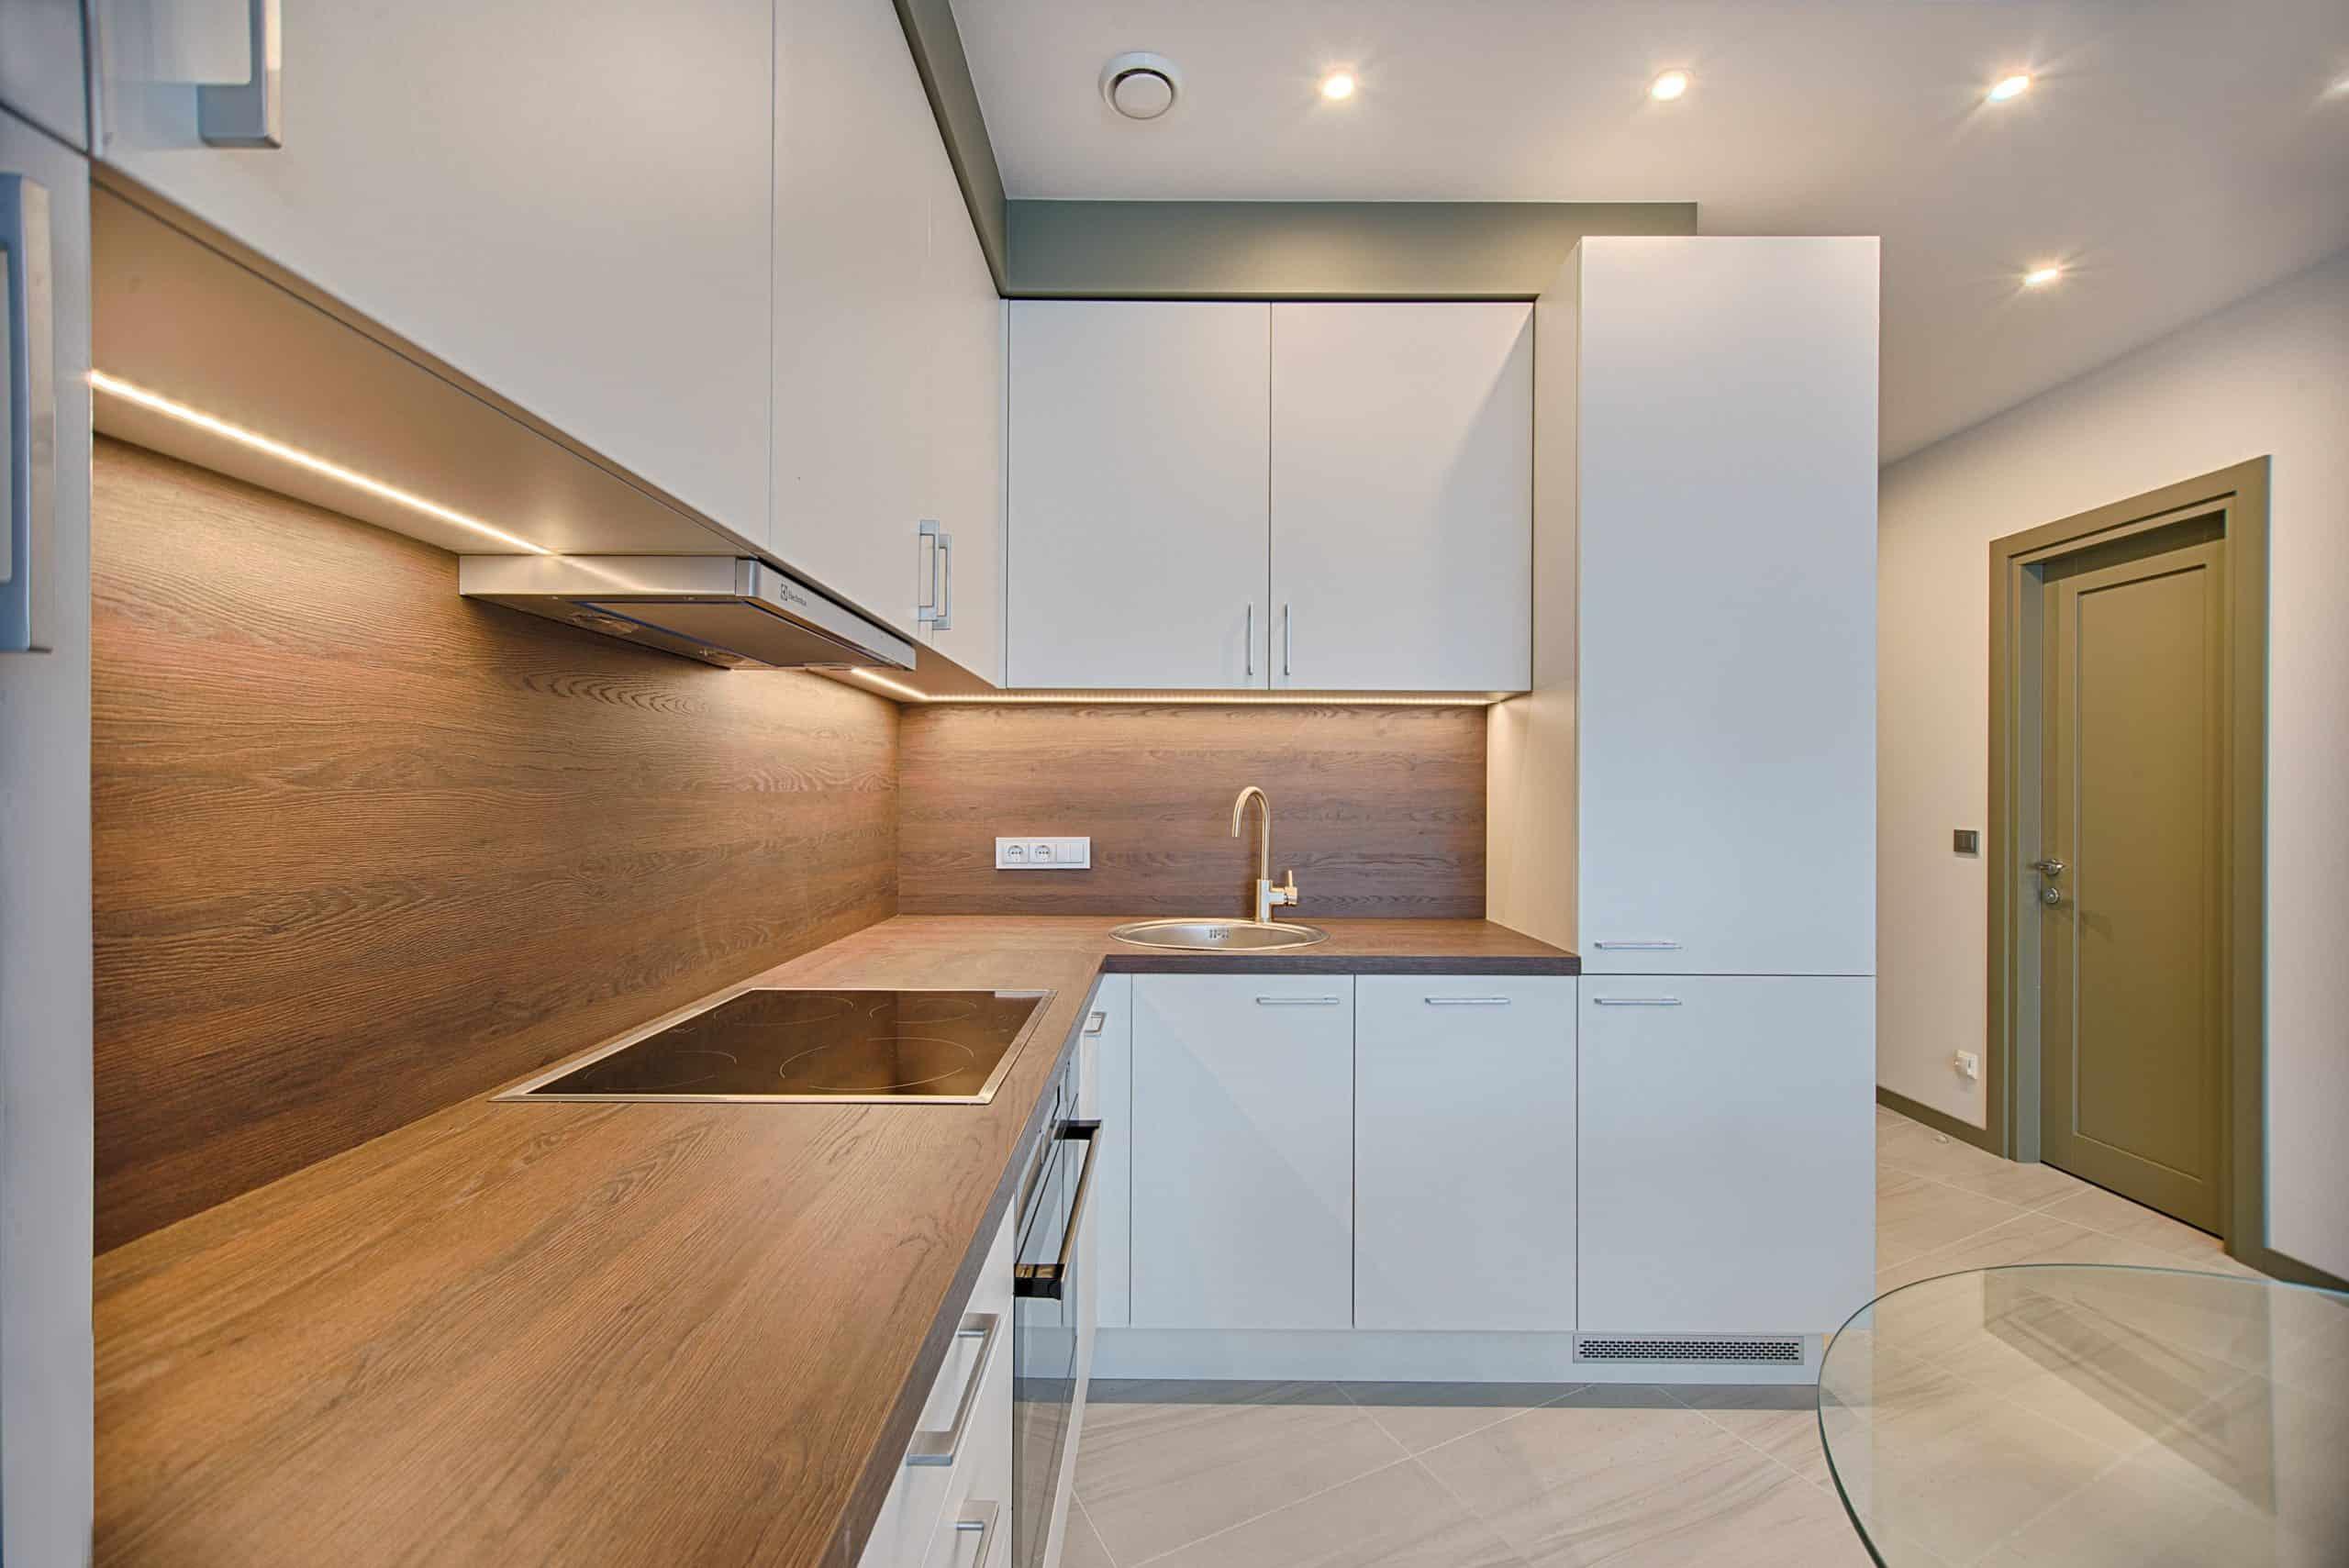 9 Beautiful Modern Kitchen Cabinets Designs and Ideas   Archute